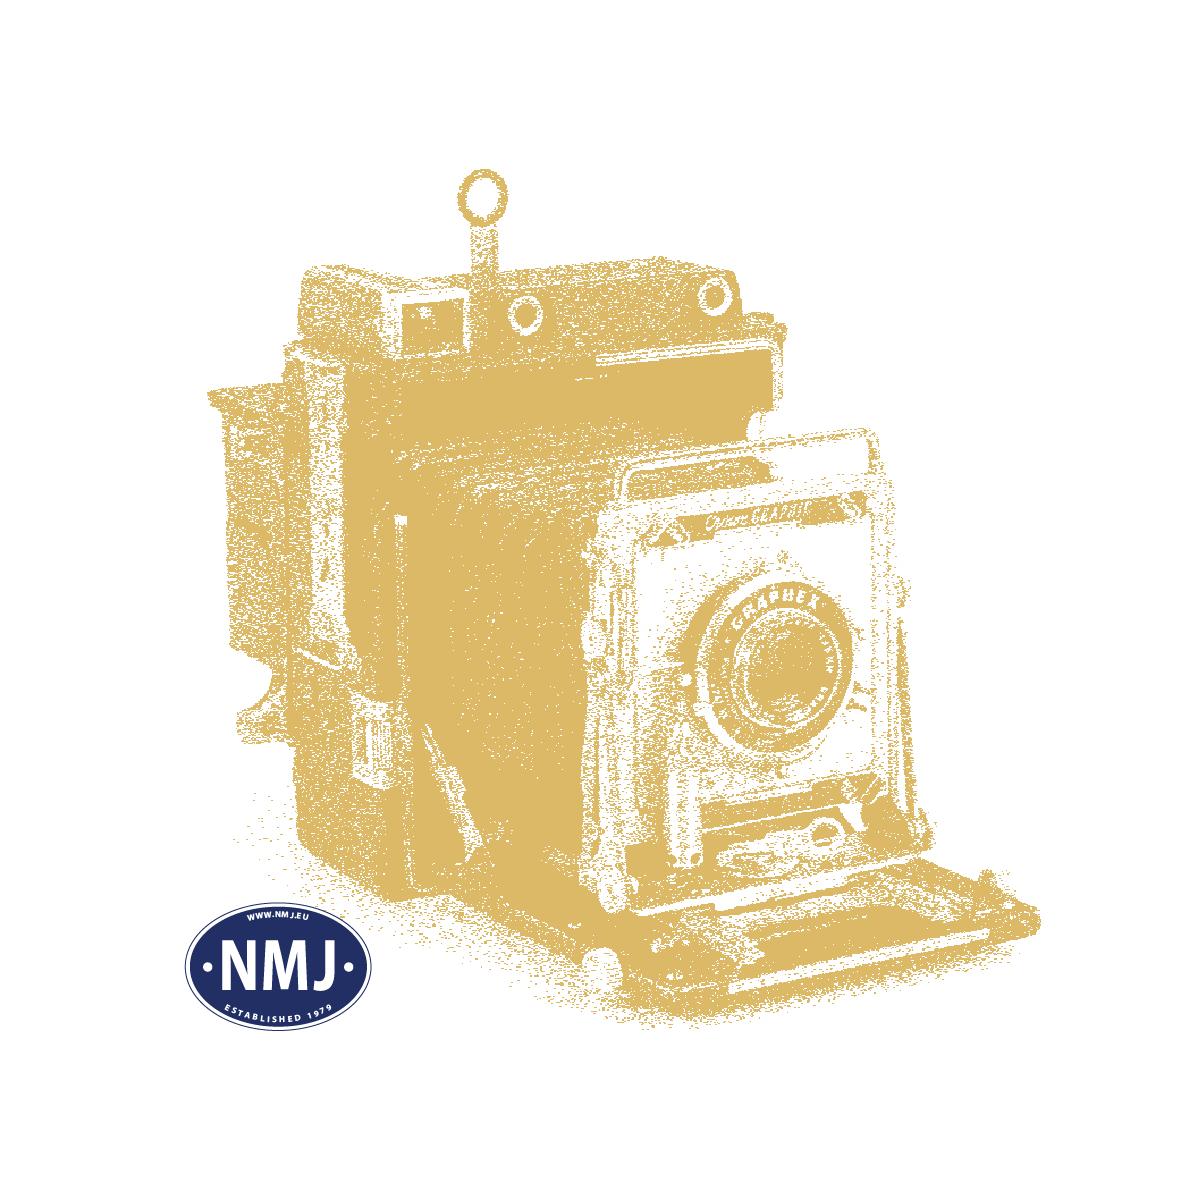 NMJT90402 - NMJ Topline 202003 Diesellok der SNCB DCC m/ Sound